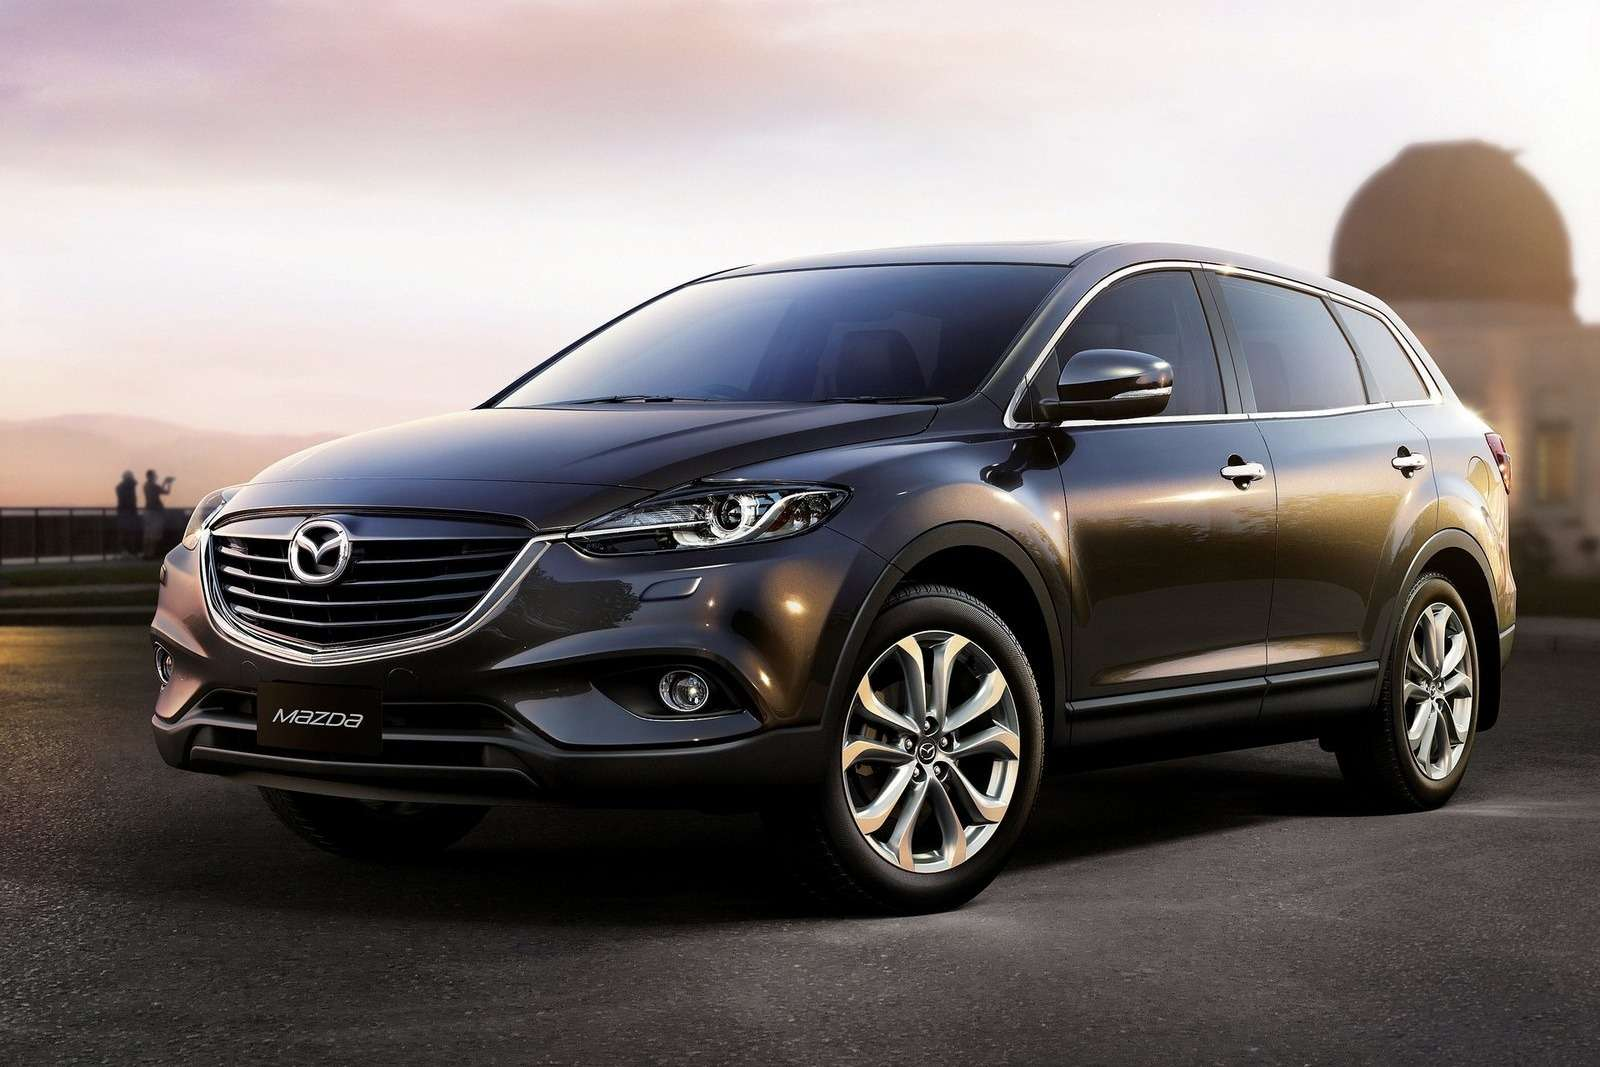 Mazda-CX-9_2013_1600x1200_wallpaper_01